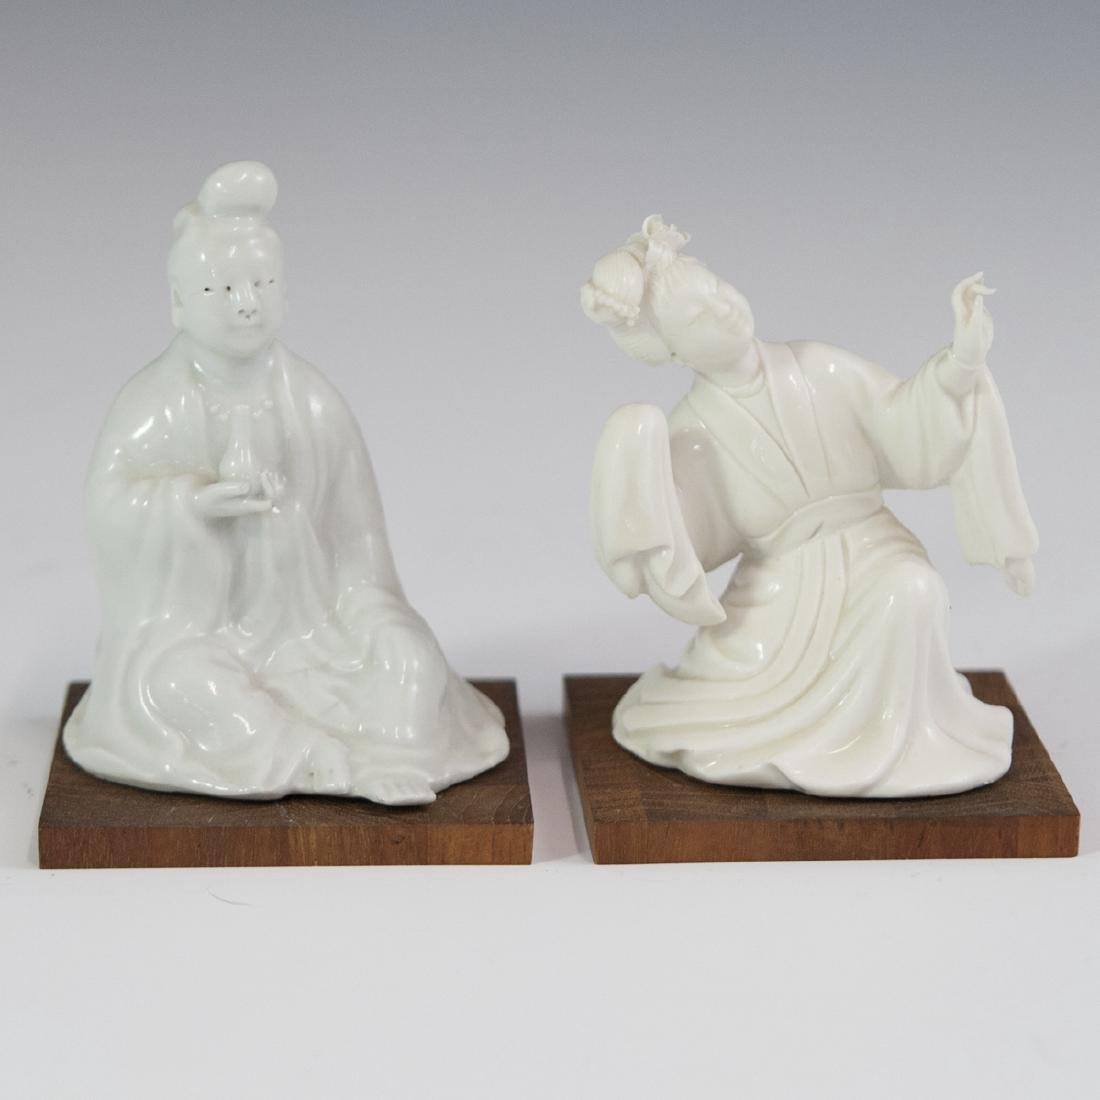 Chinese Blanc De Chine Figurines